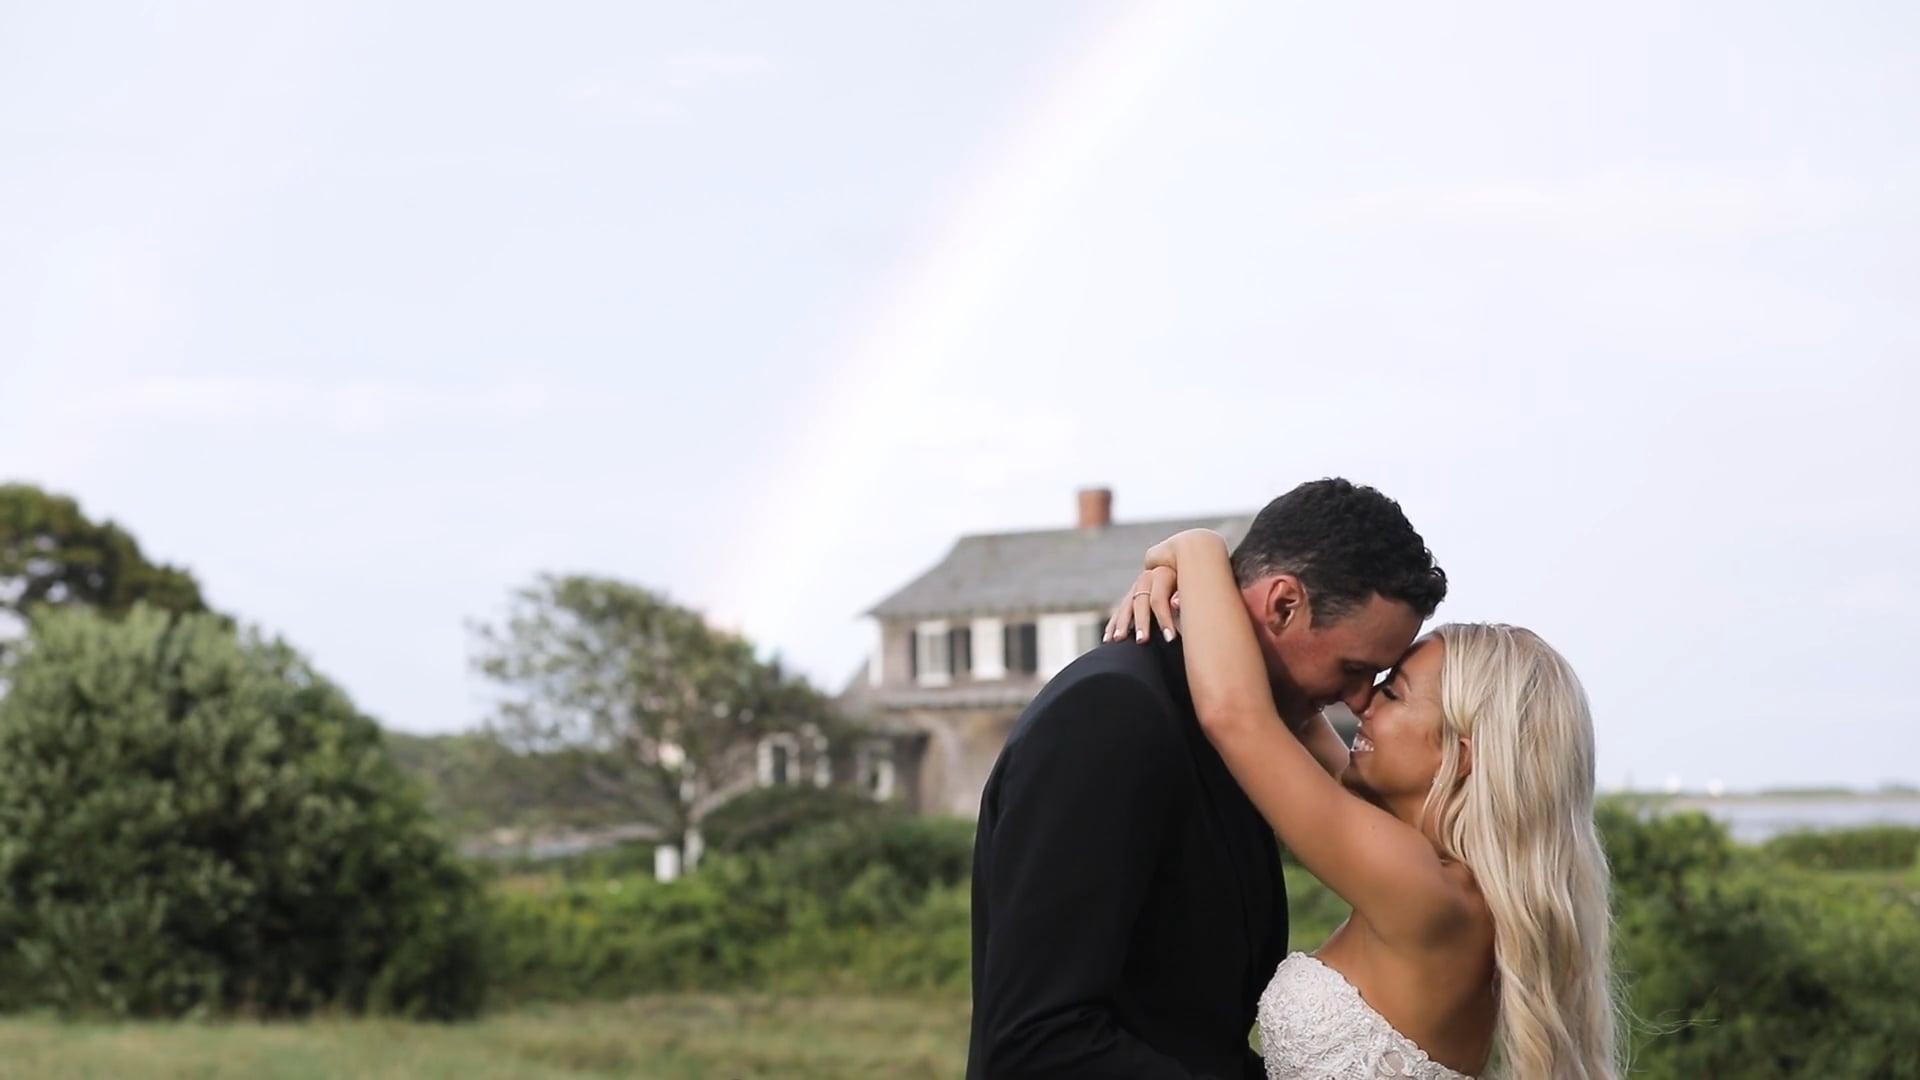 Kayla & Brian's Wedding Film in Kennebunkport, ME